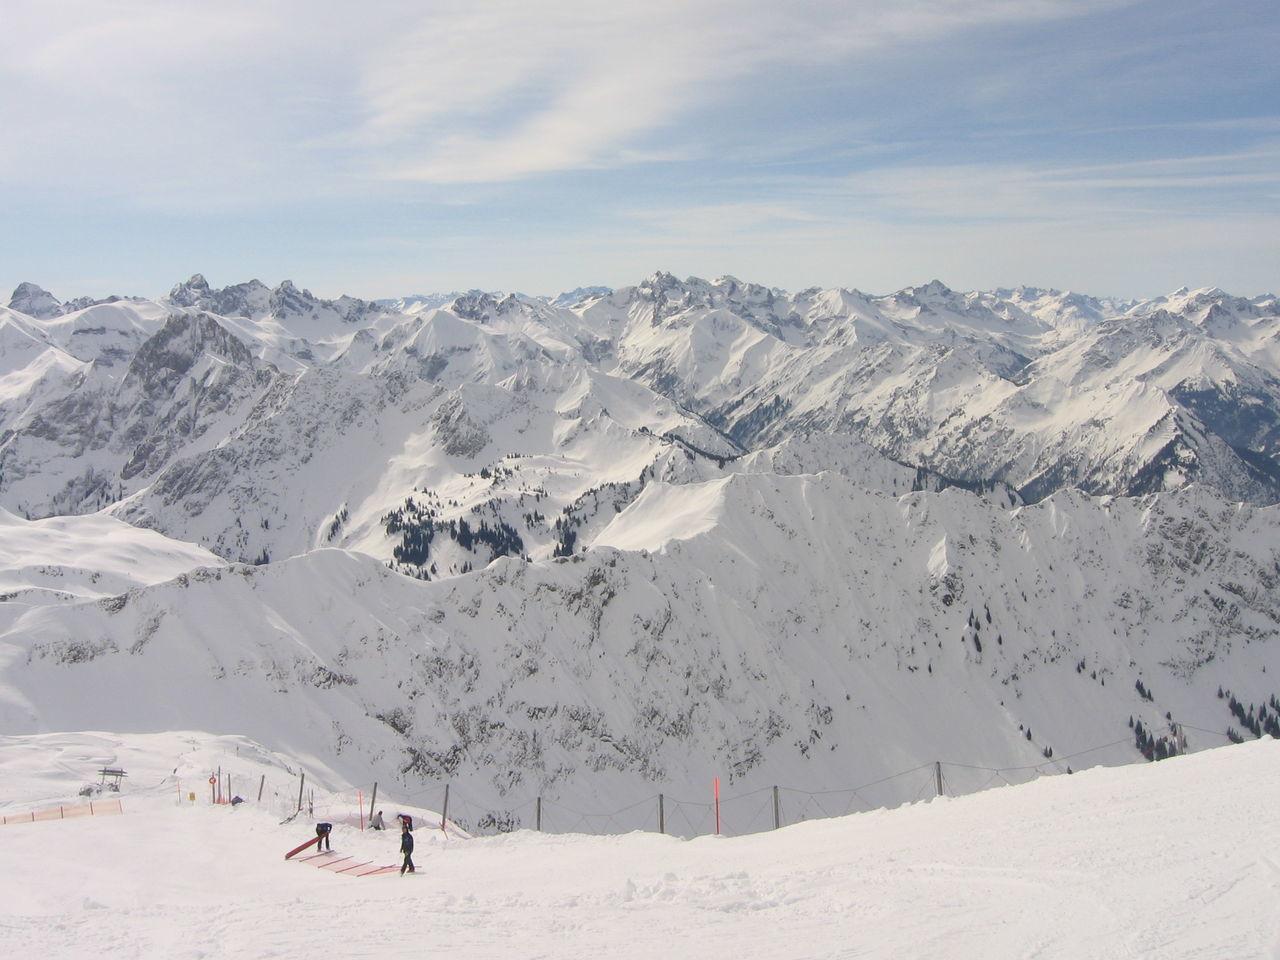 Blue Day Mountain Nature Oberstdorf & Umgebung Outdoors Ski Snow Snowboard White Winter